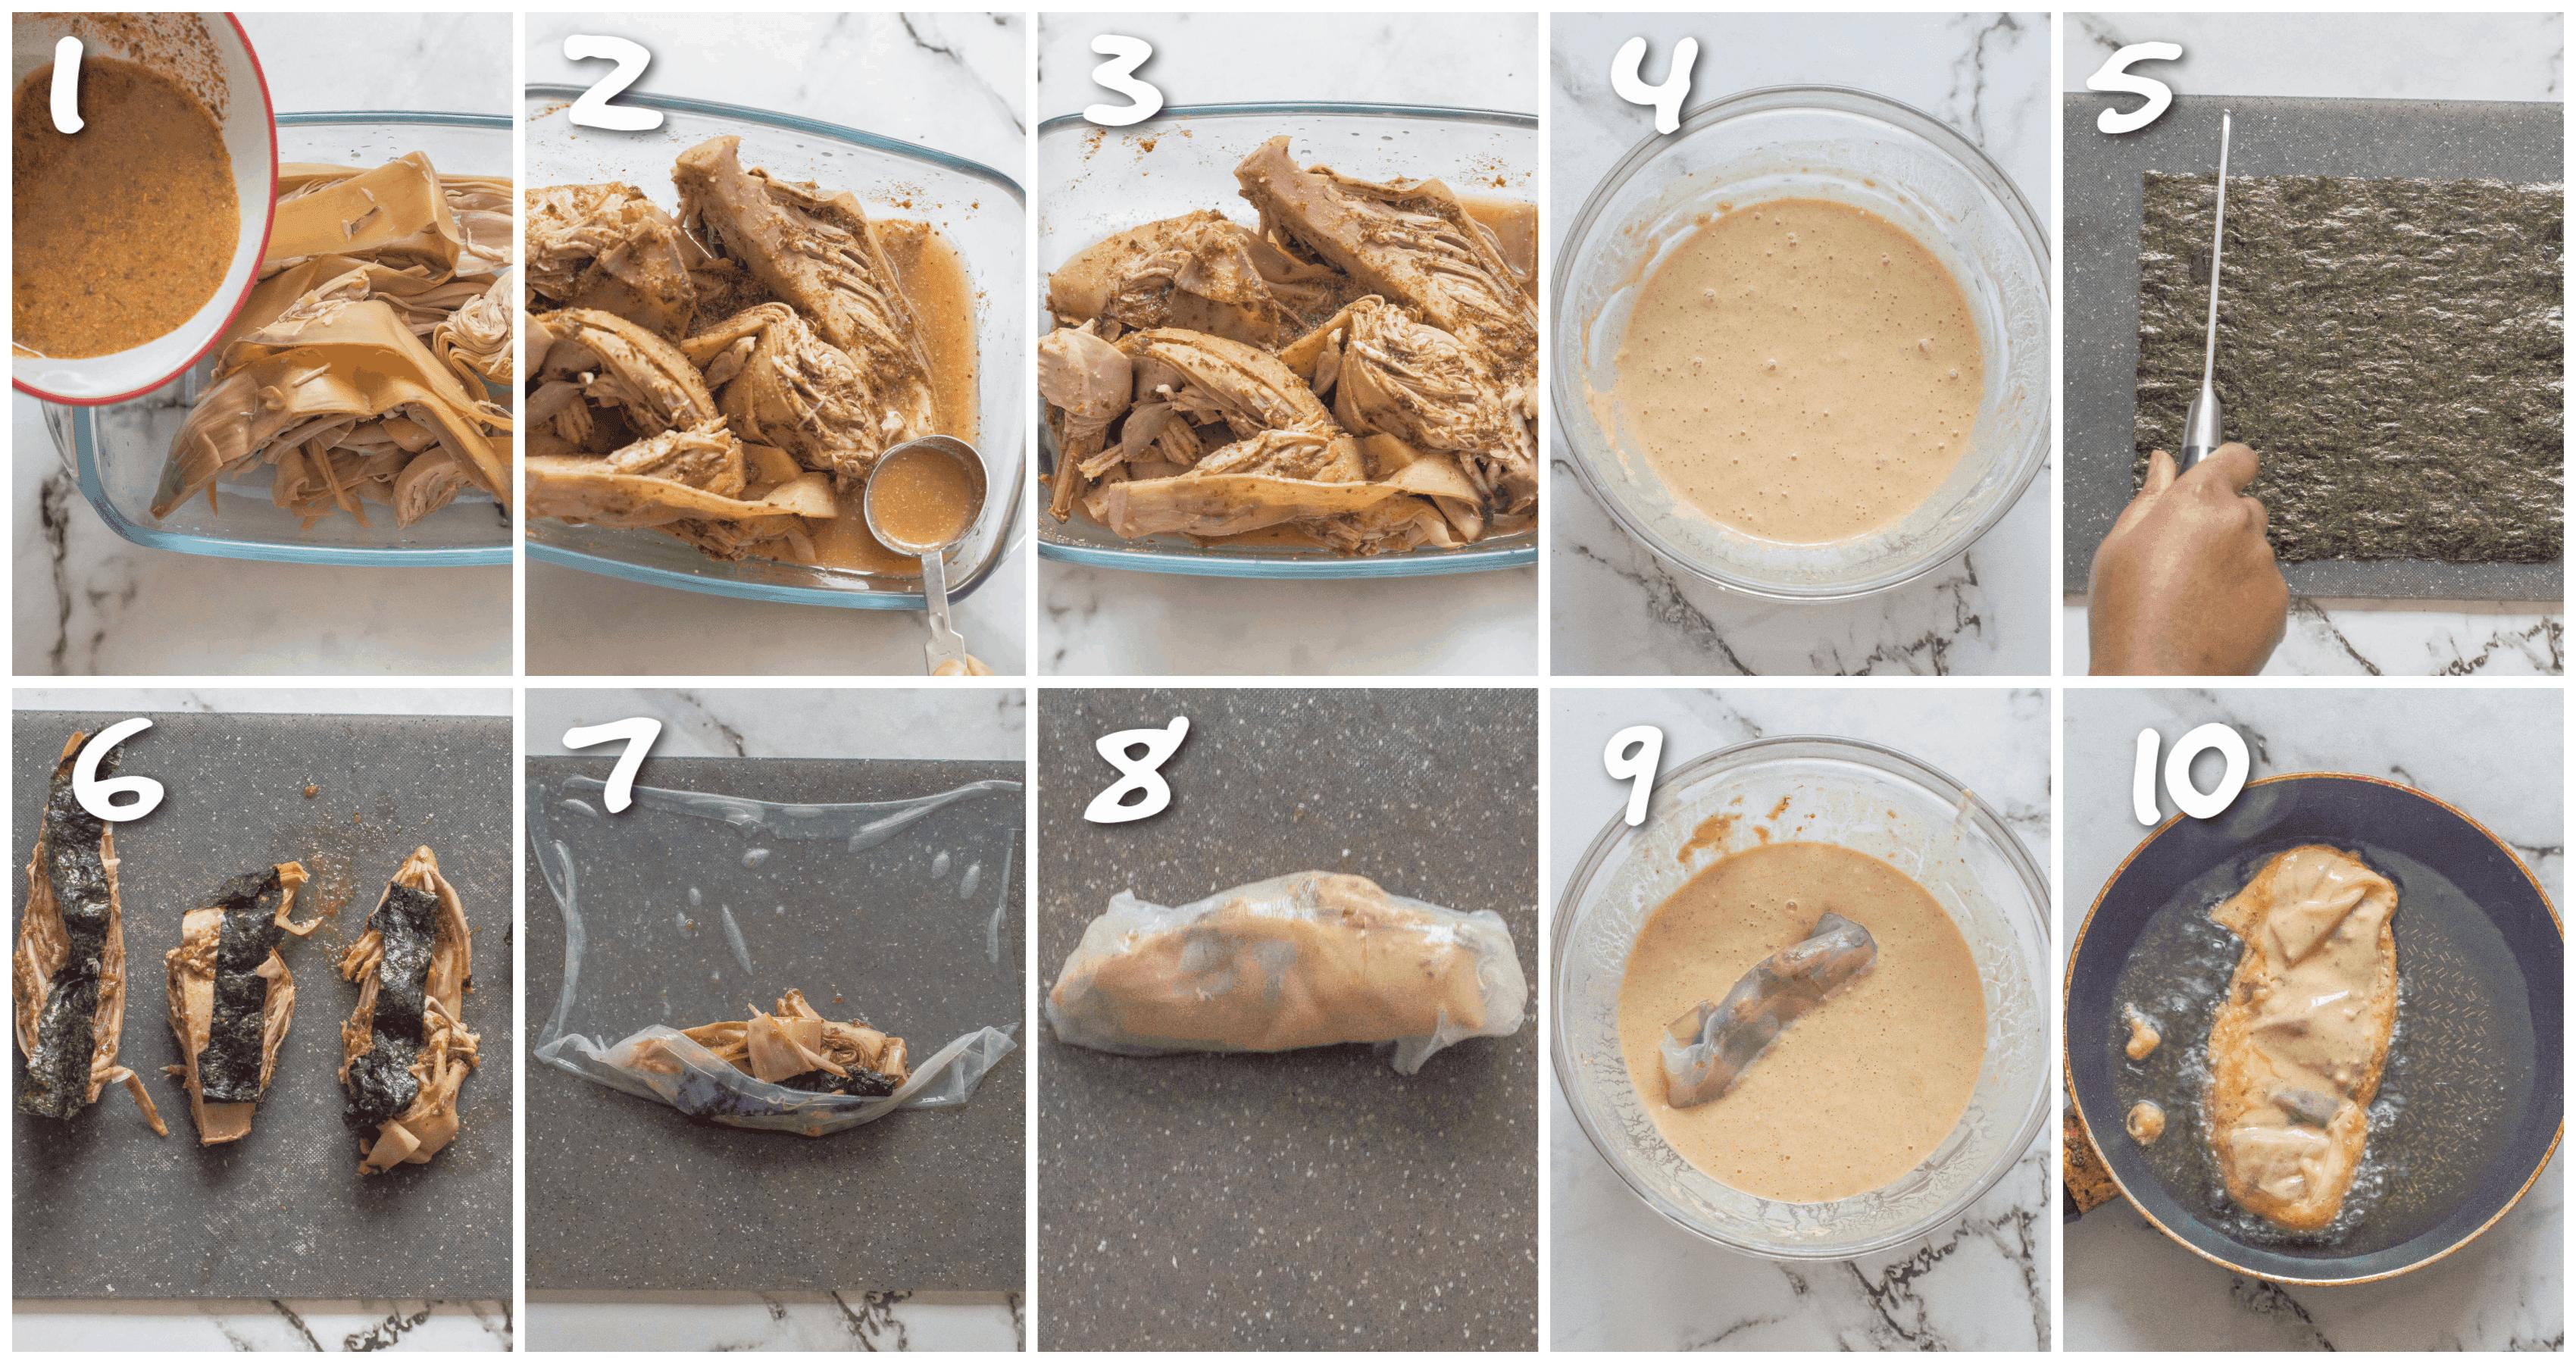 steps1-10 marinating the banana blossom and frying